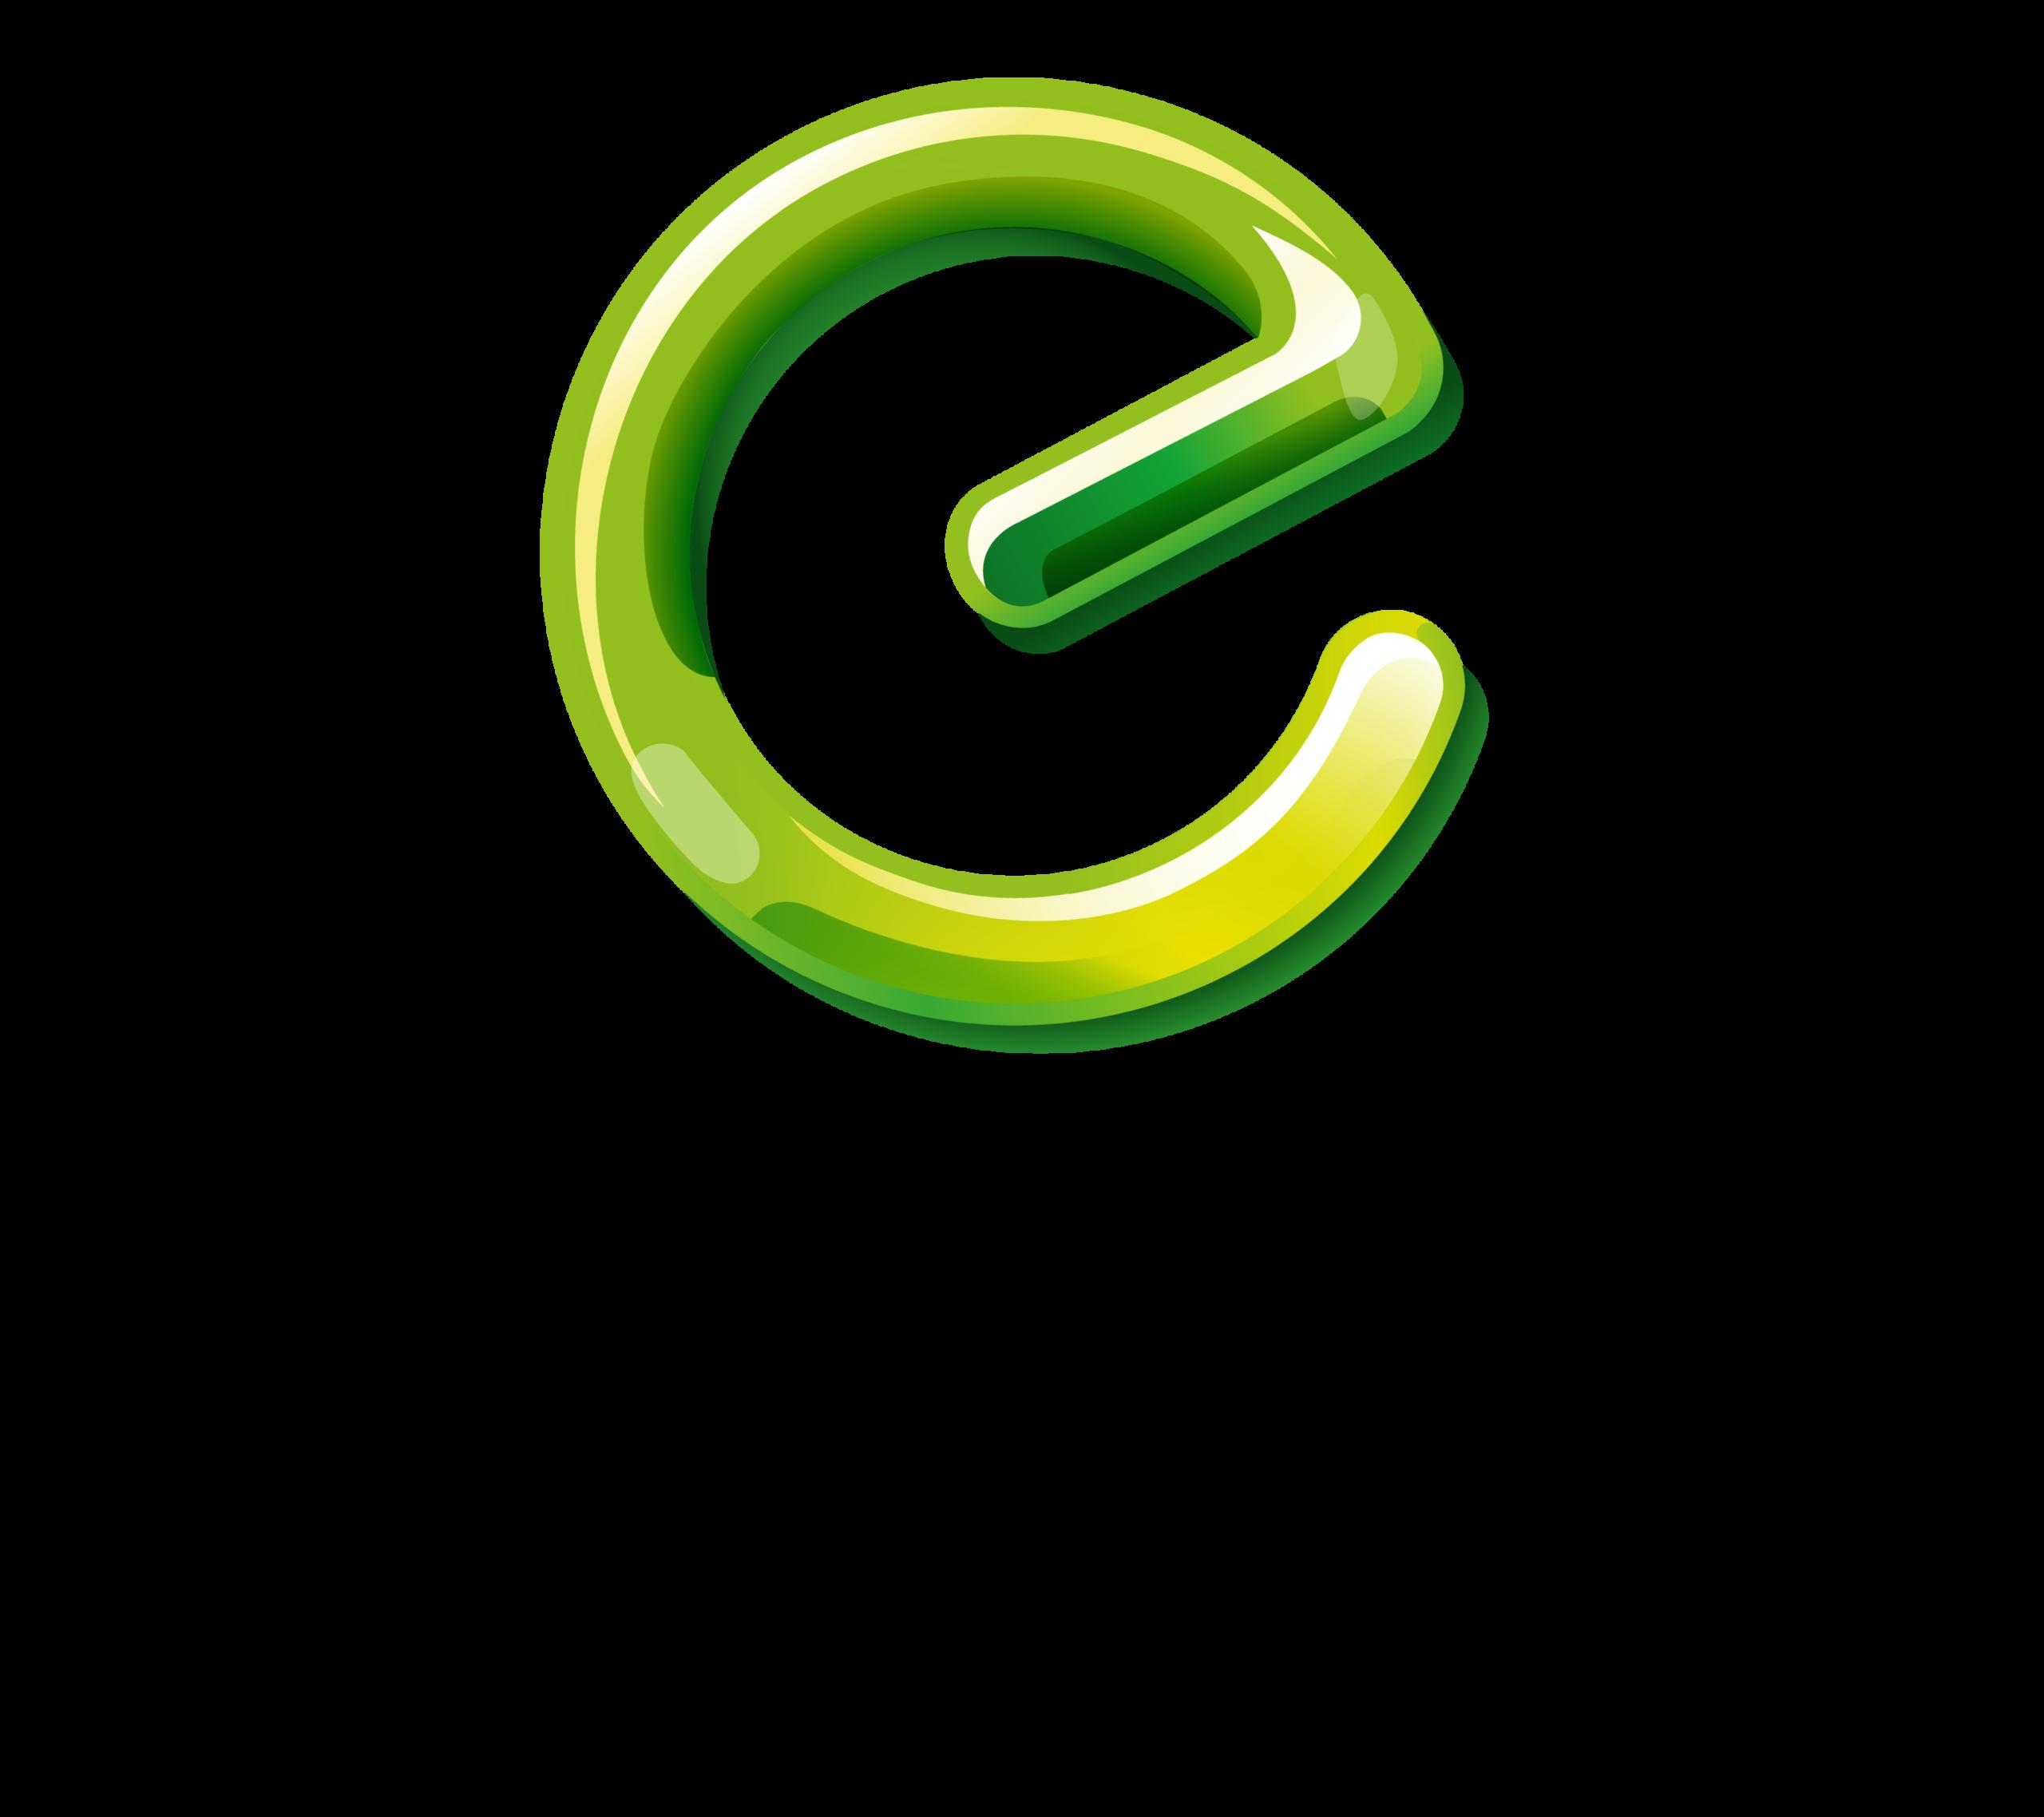 EnergyAustralia - Light the way